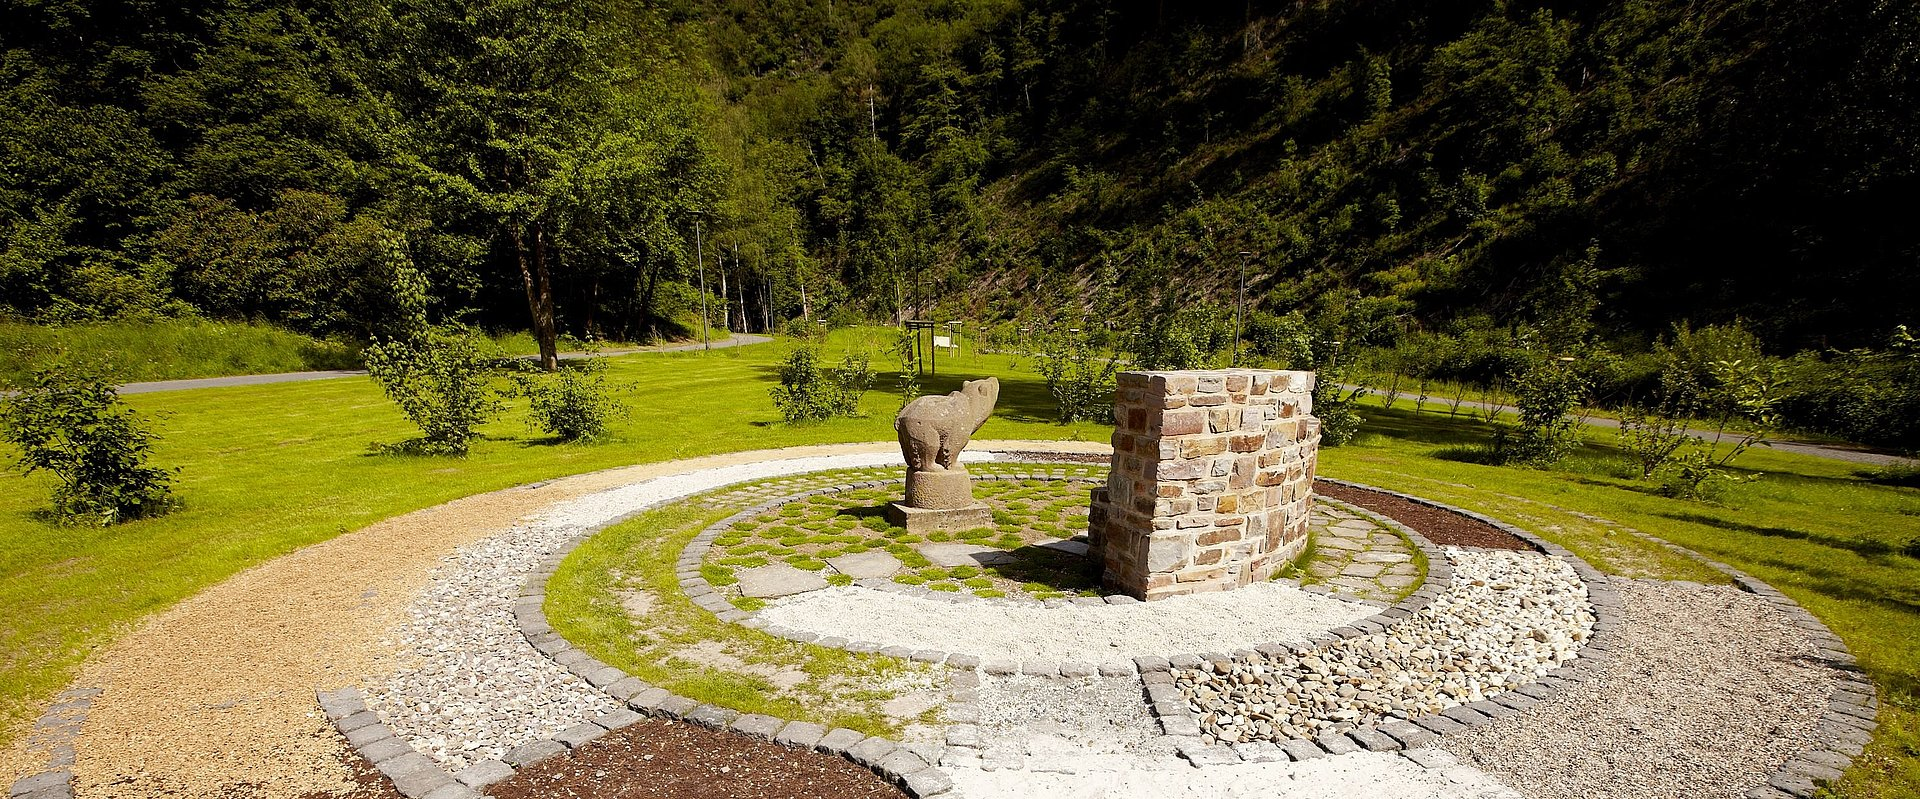 Ontspanning en rust in het landschapstherapeutisch park Römerkessel in Bad Bertrich, Eifel